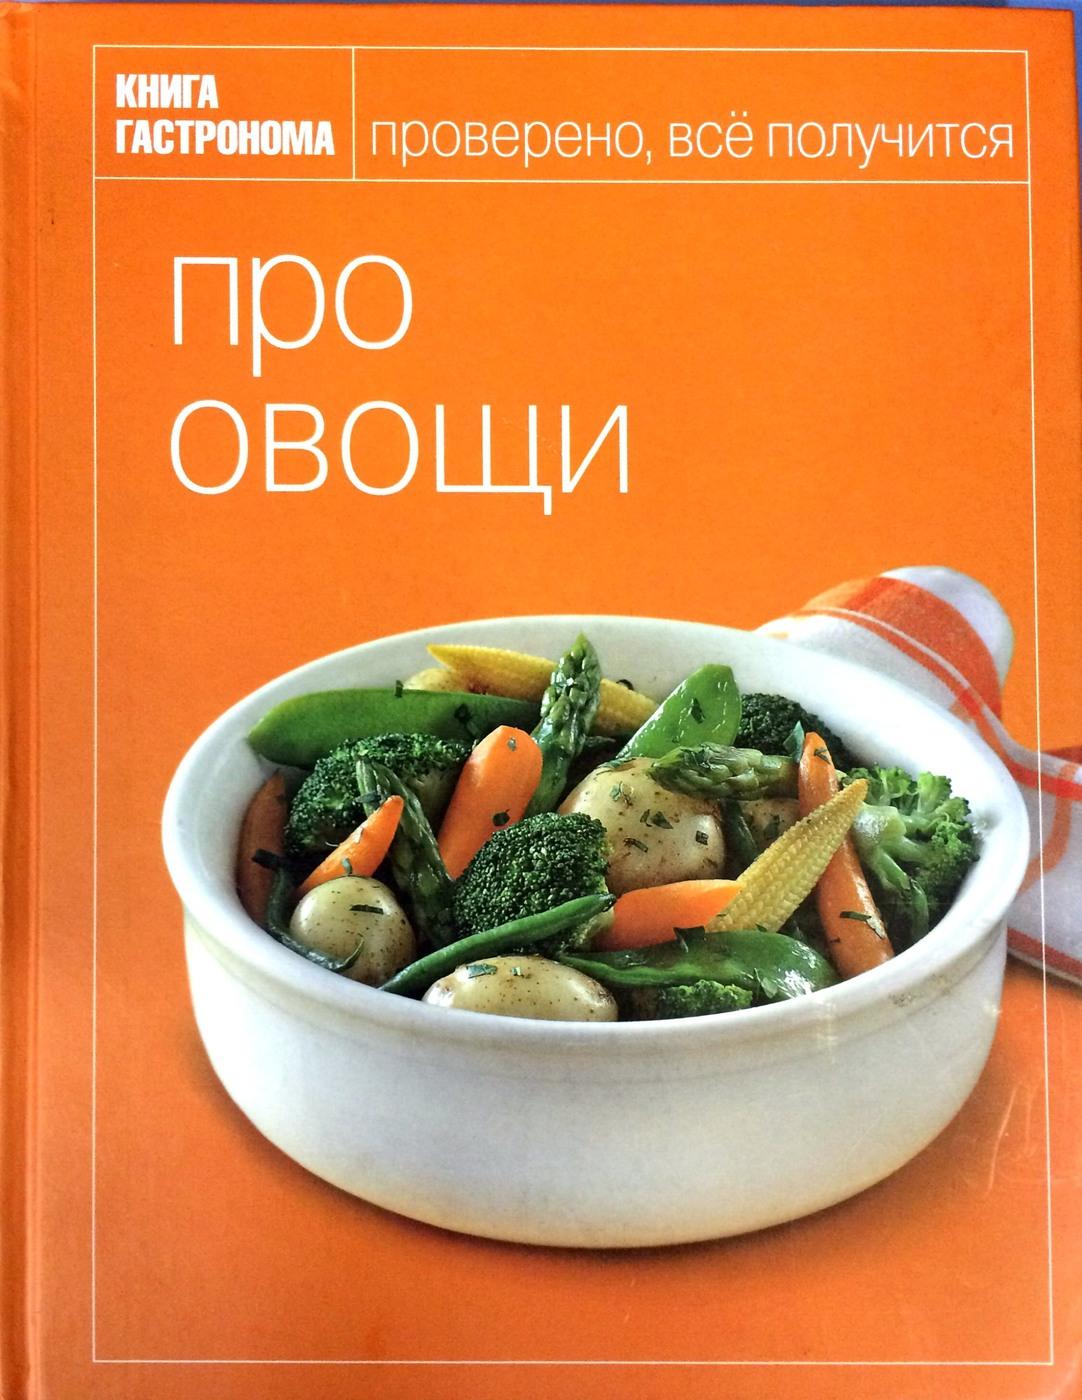 Ю. Некоркина. Про овощи